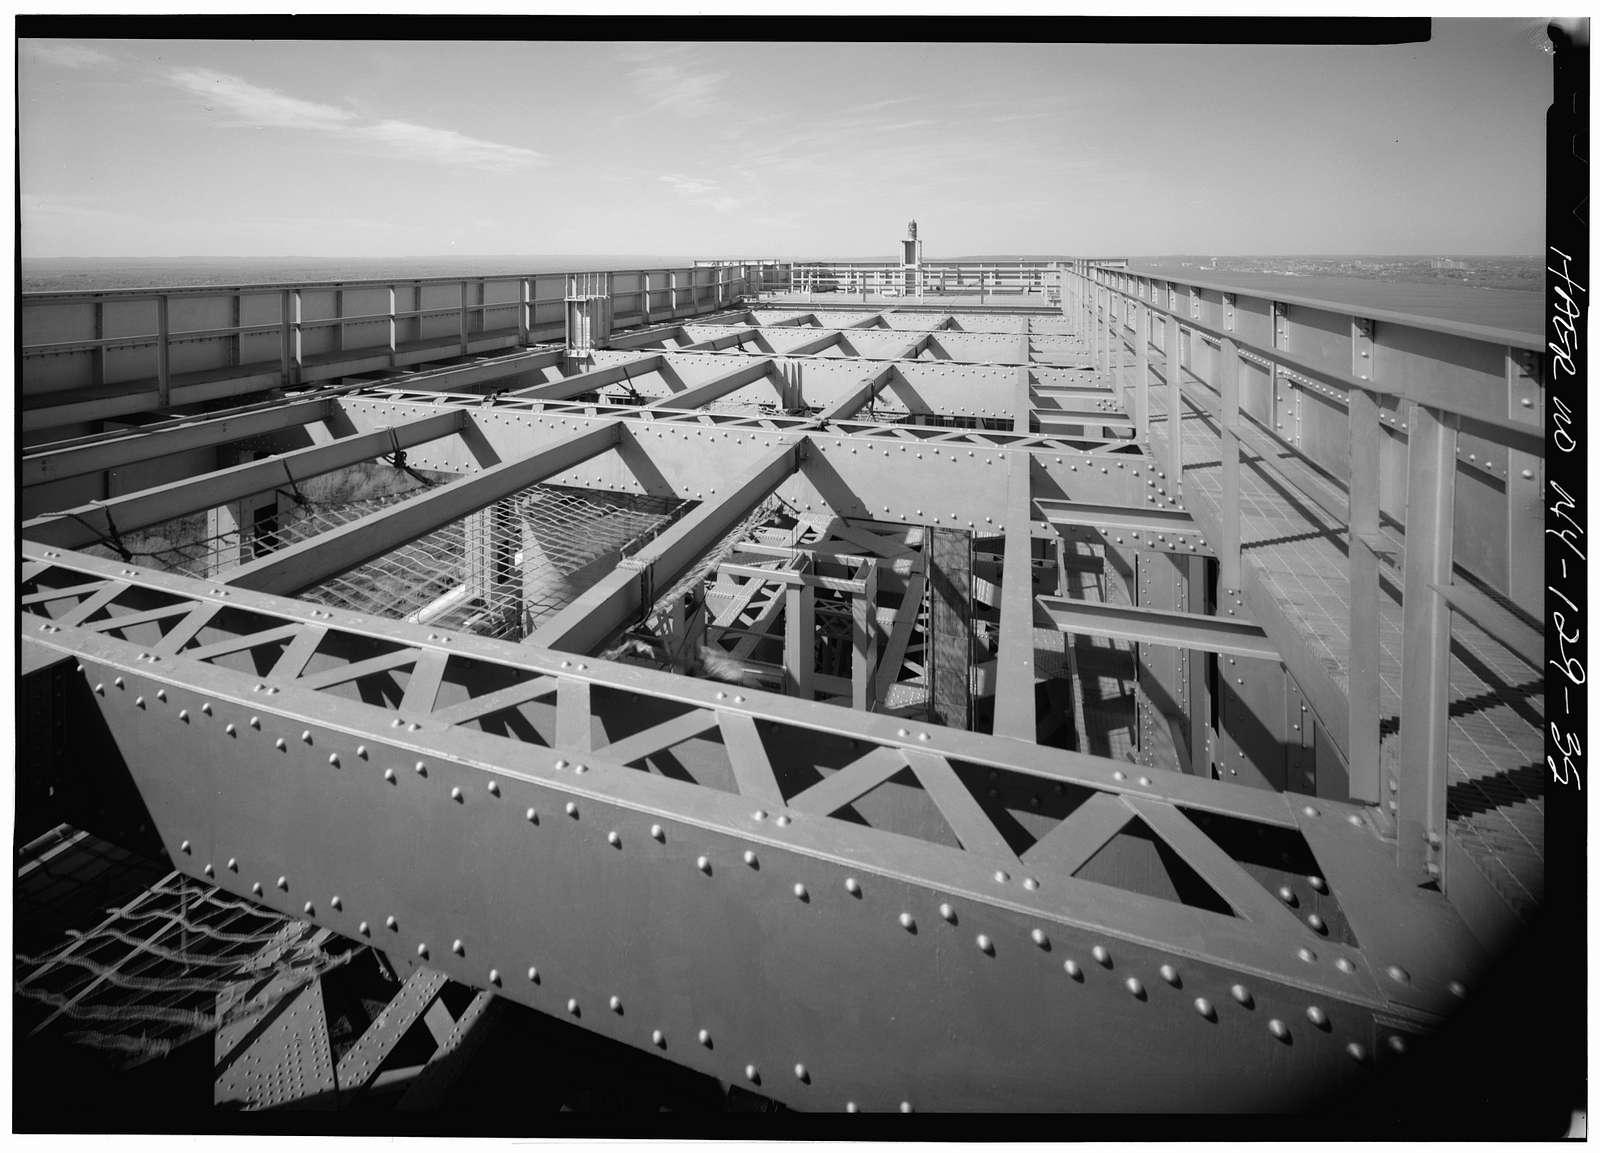 George Washington Bridge, Spanning Hudson River between Manhattan & Fort Lee, NJ, New York, New York County, NY